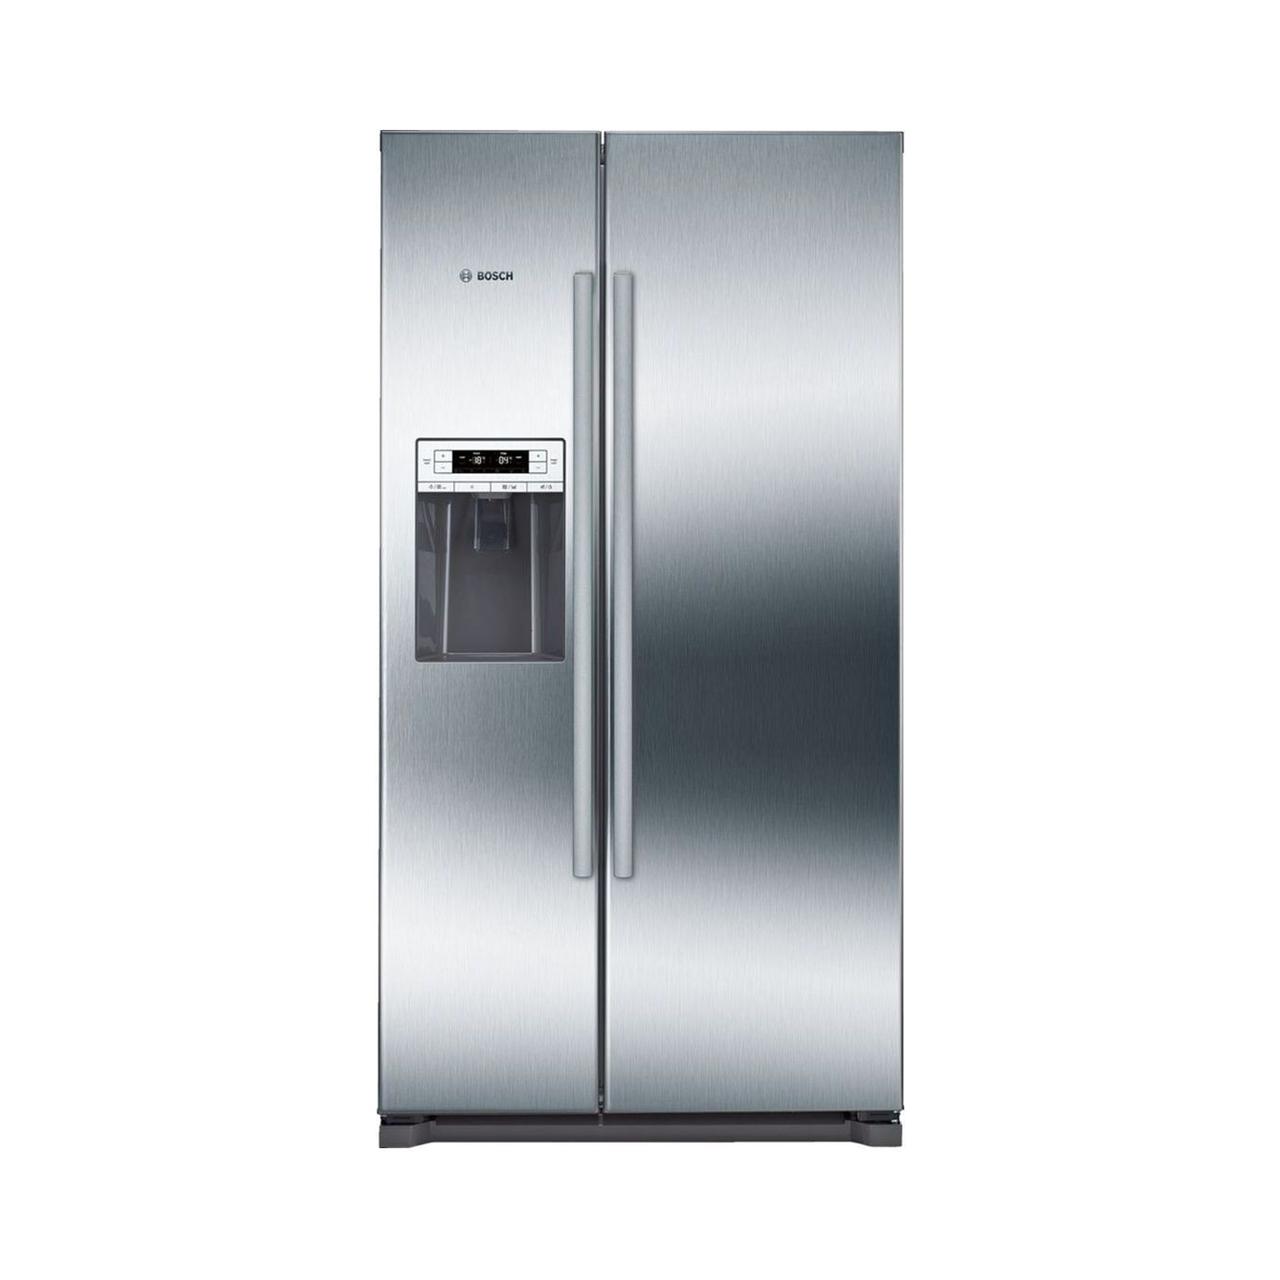 Tủ lạnh side by side BOSCH HMH.KAI90VI20G Serie 6